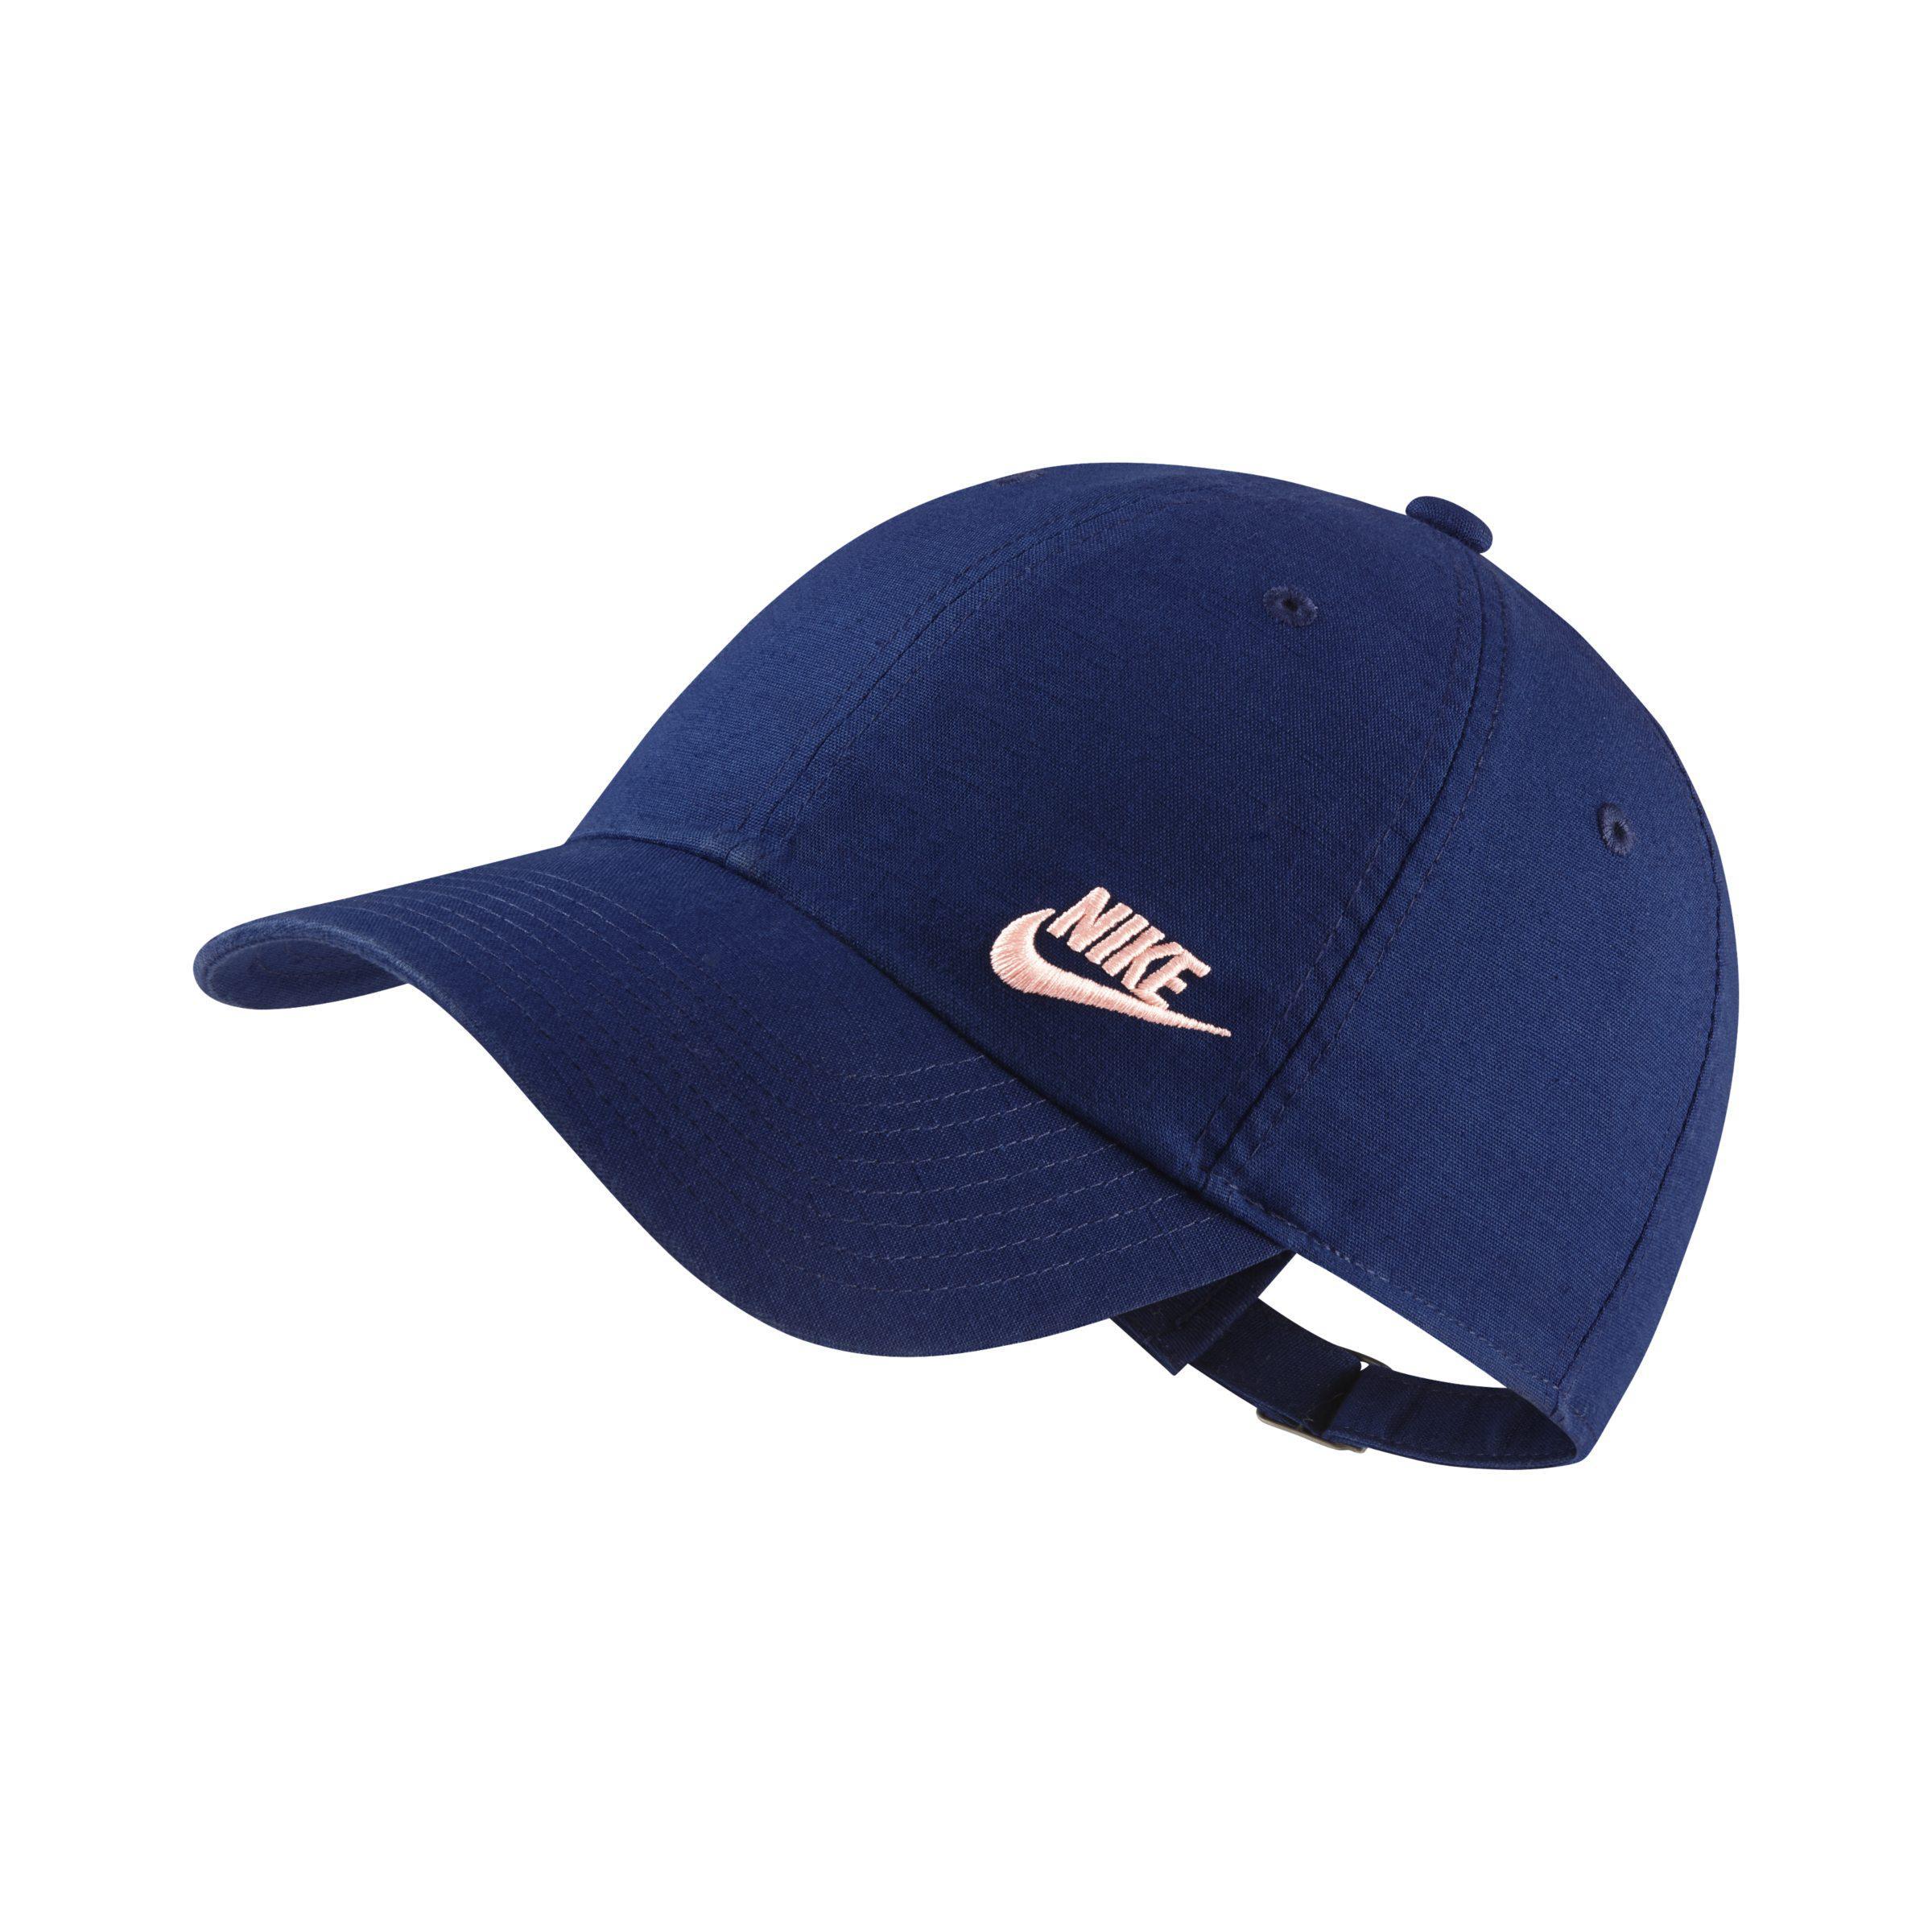 4d1b73cadf6 Nike Sportswear Heritage 86 Futura Adjustable Hat in Blue - Lyst